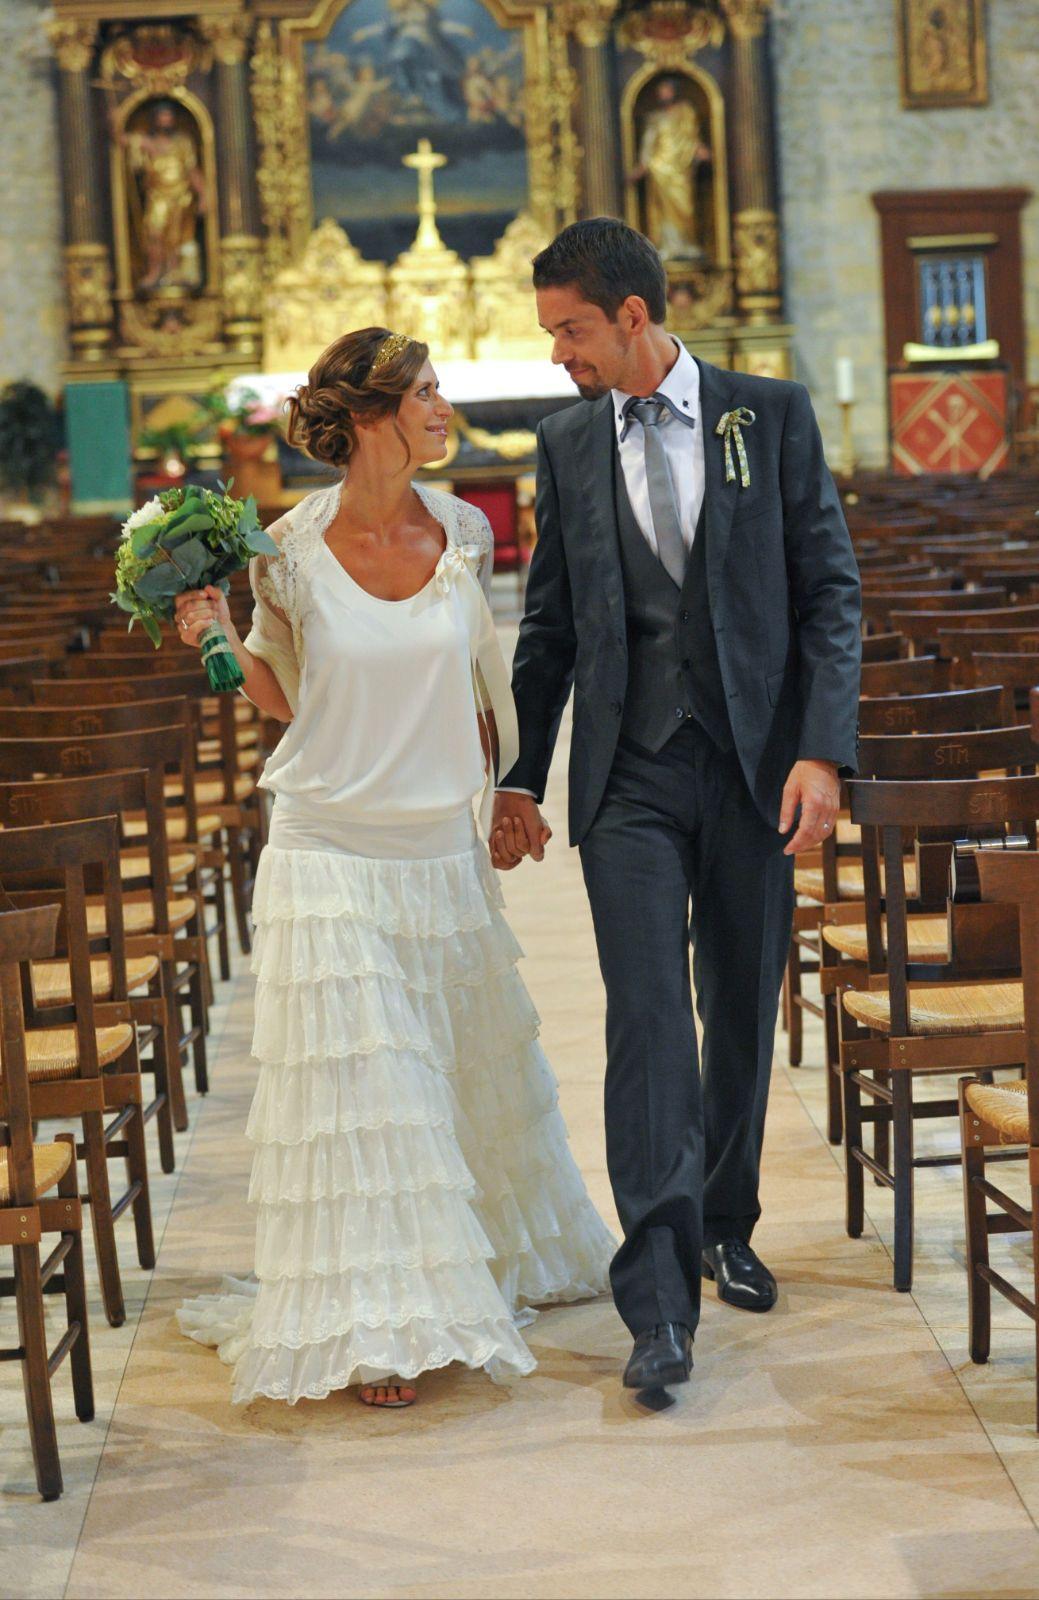 Anne of green gables wedding dress  vraimariagelamarieeauxpiedsnusmariageliberty  mariage